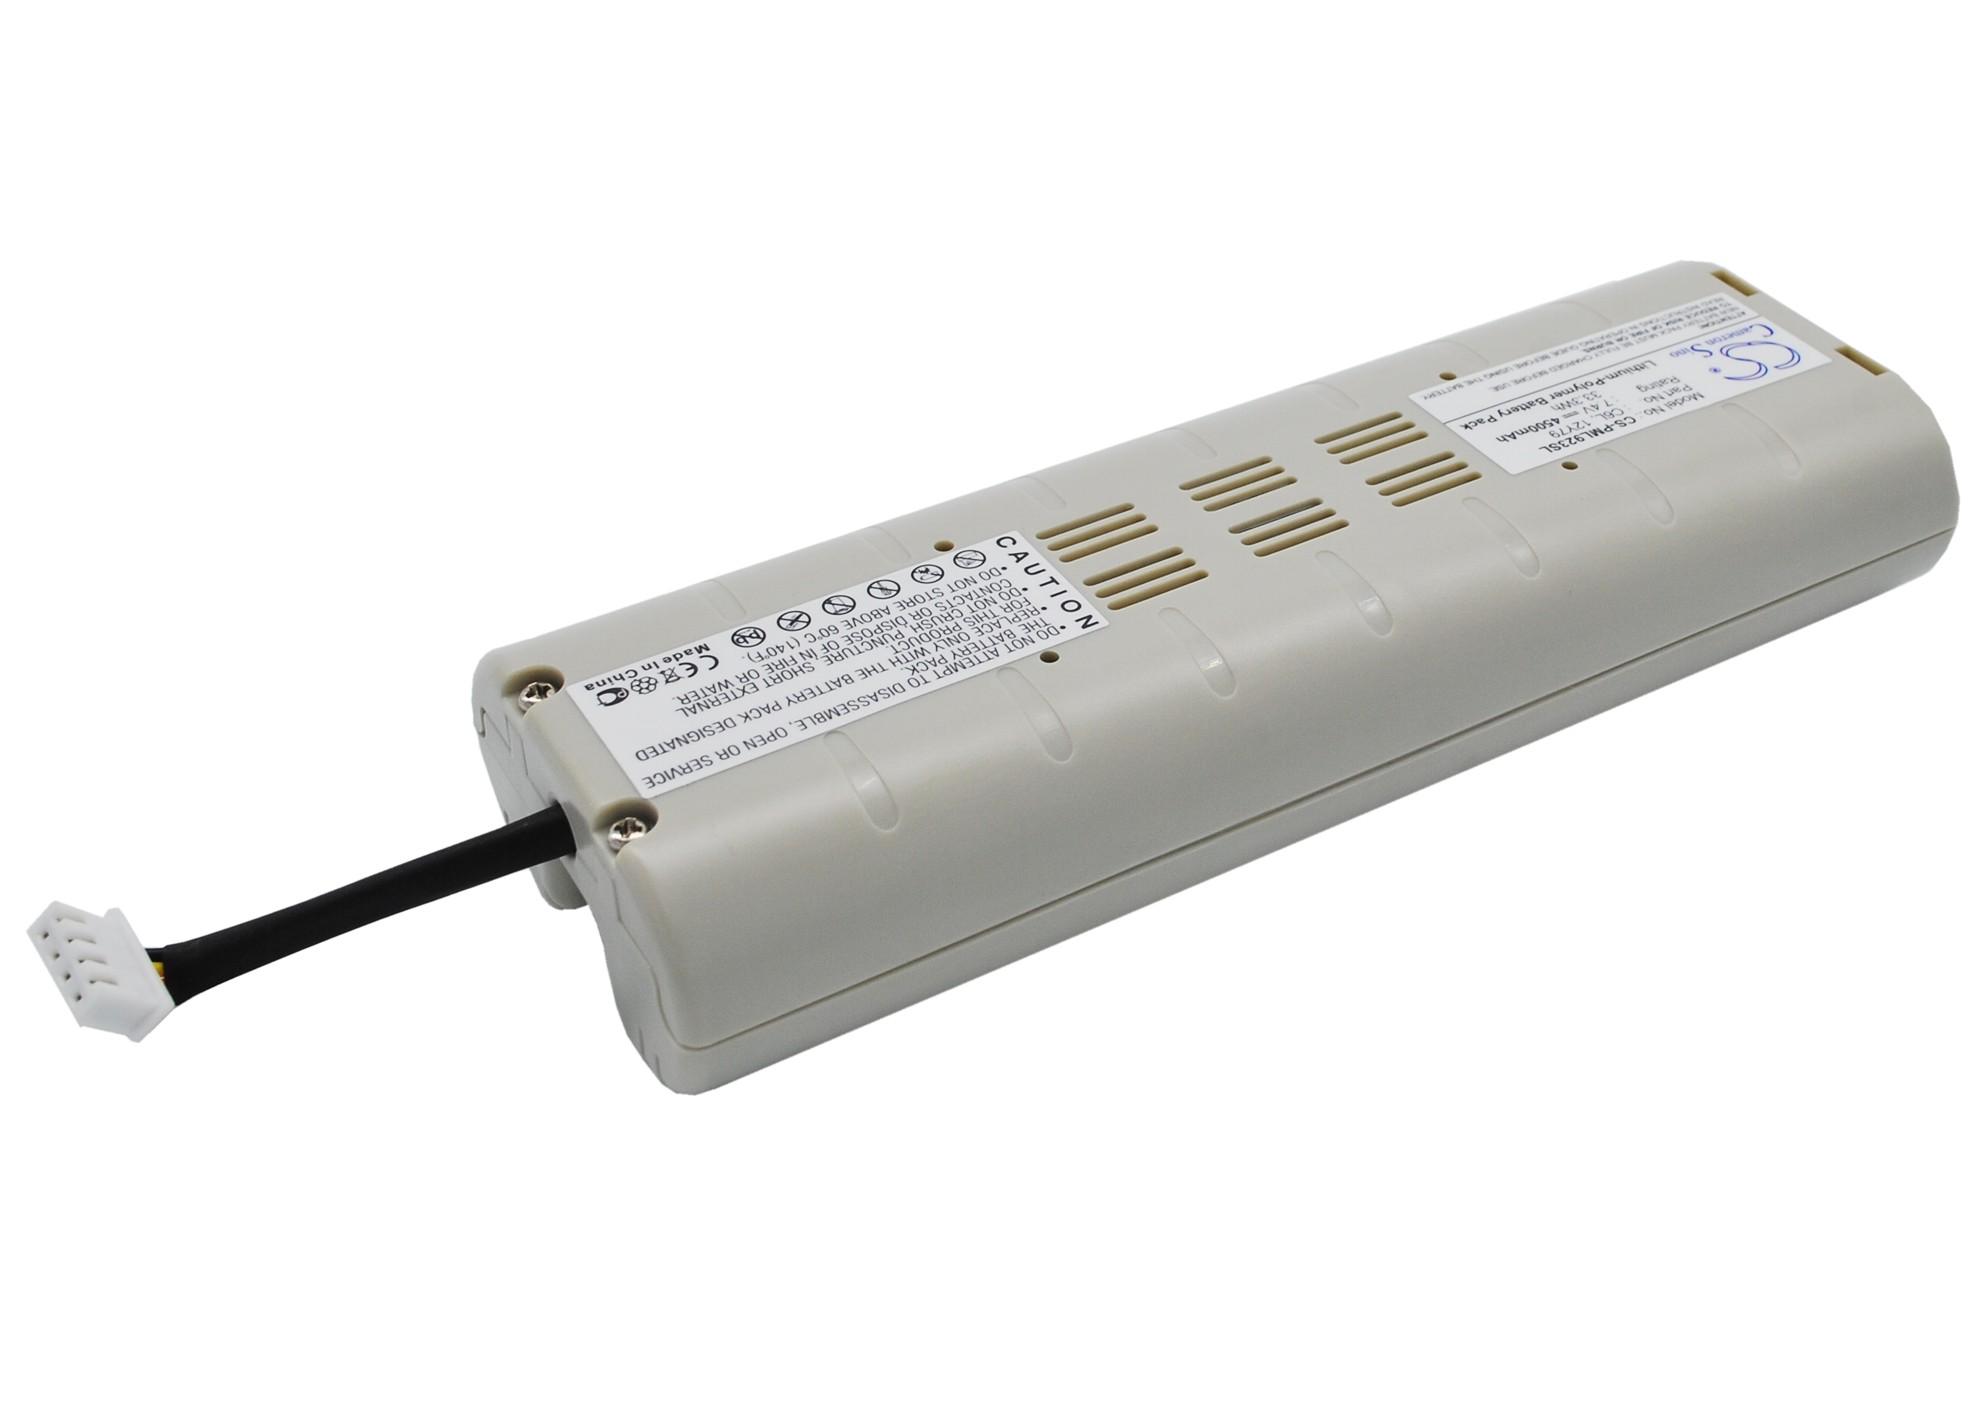 Cameron Sino baterie do digitálních rádií pro PURE Evoke 2XT 7.4V Li-Polymer 4500mAh šedá bílá - neoriginální